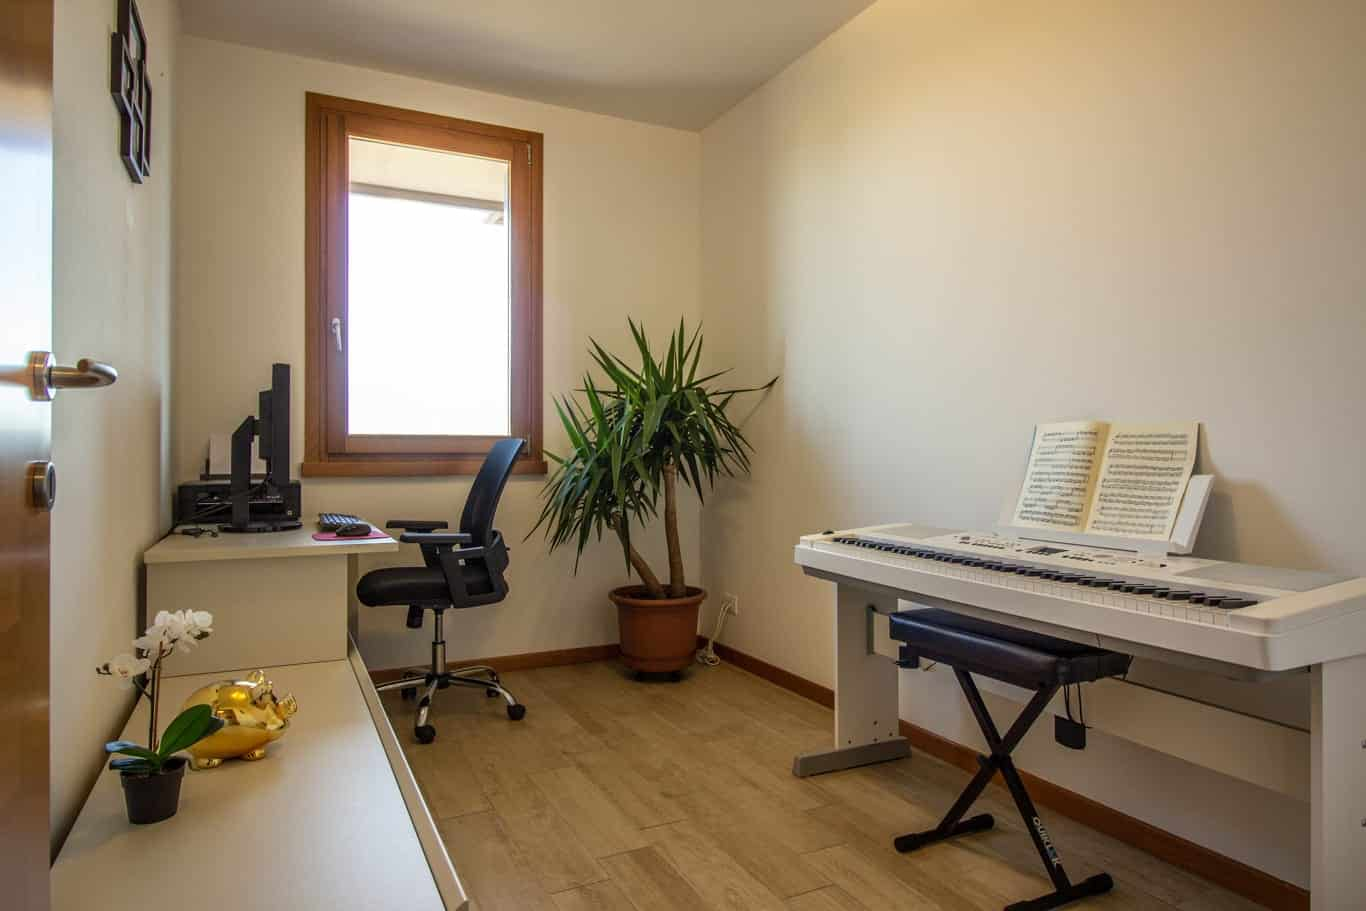 Appartamento_cimpello (4 of 8)